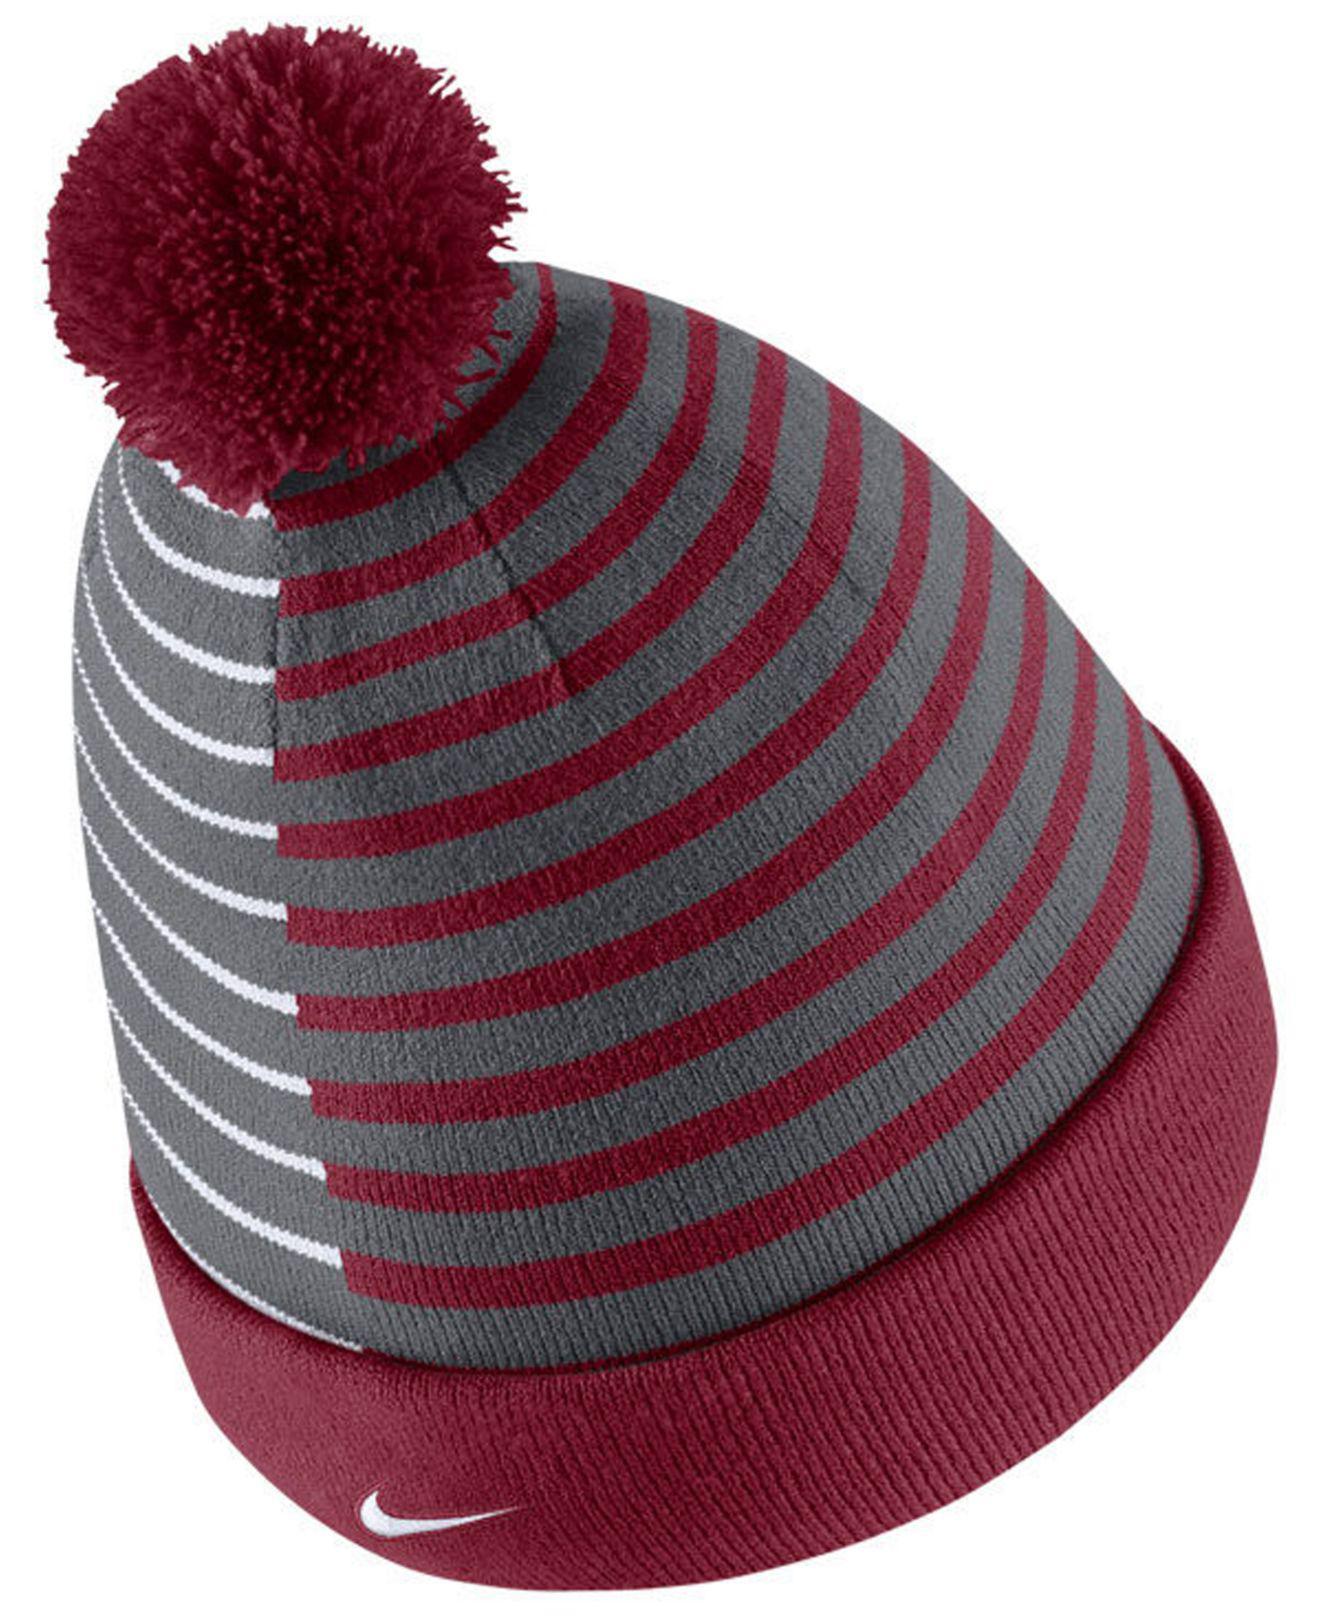 57a41e256 greece washington state knit 1e695 3a289